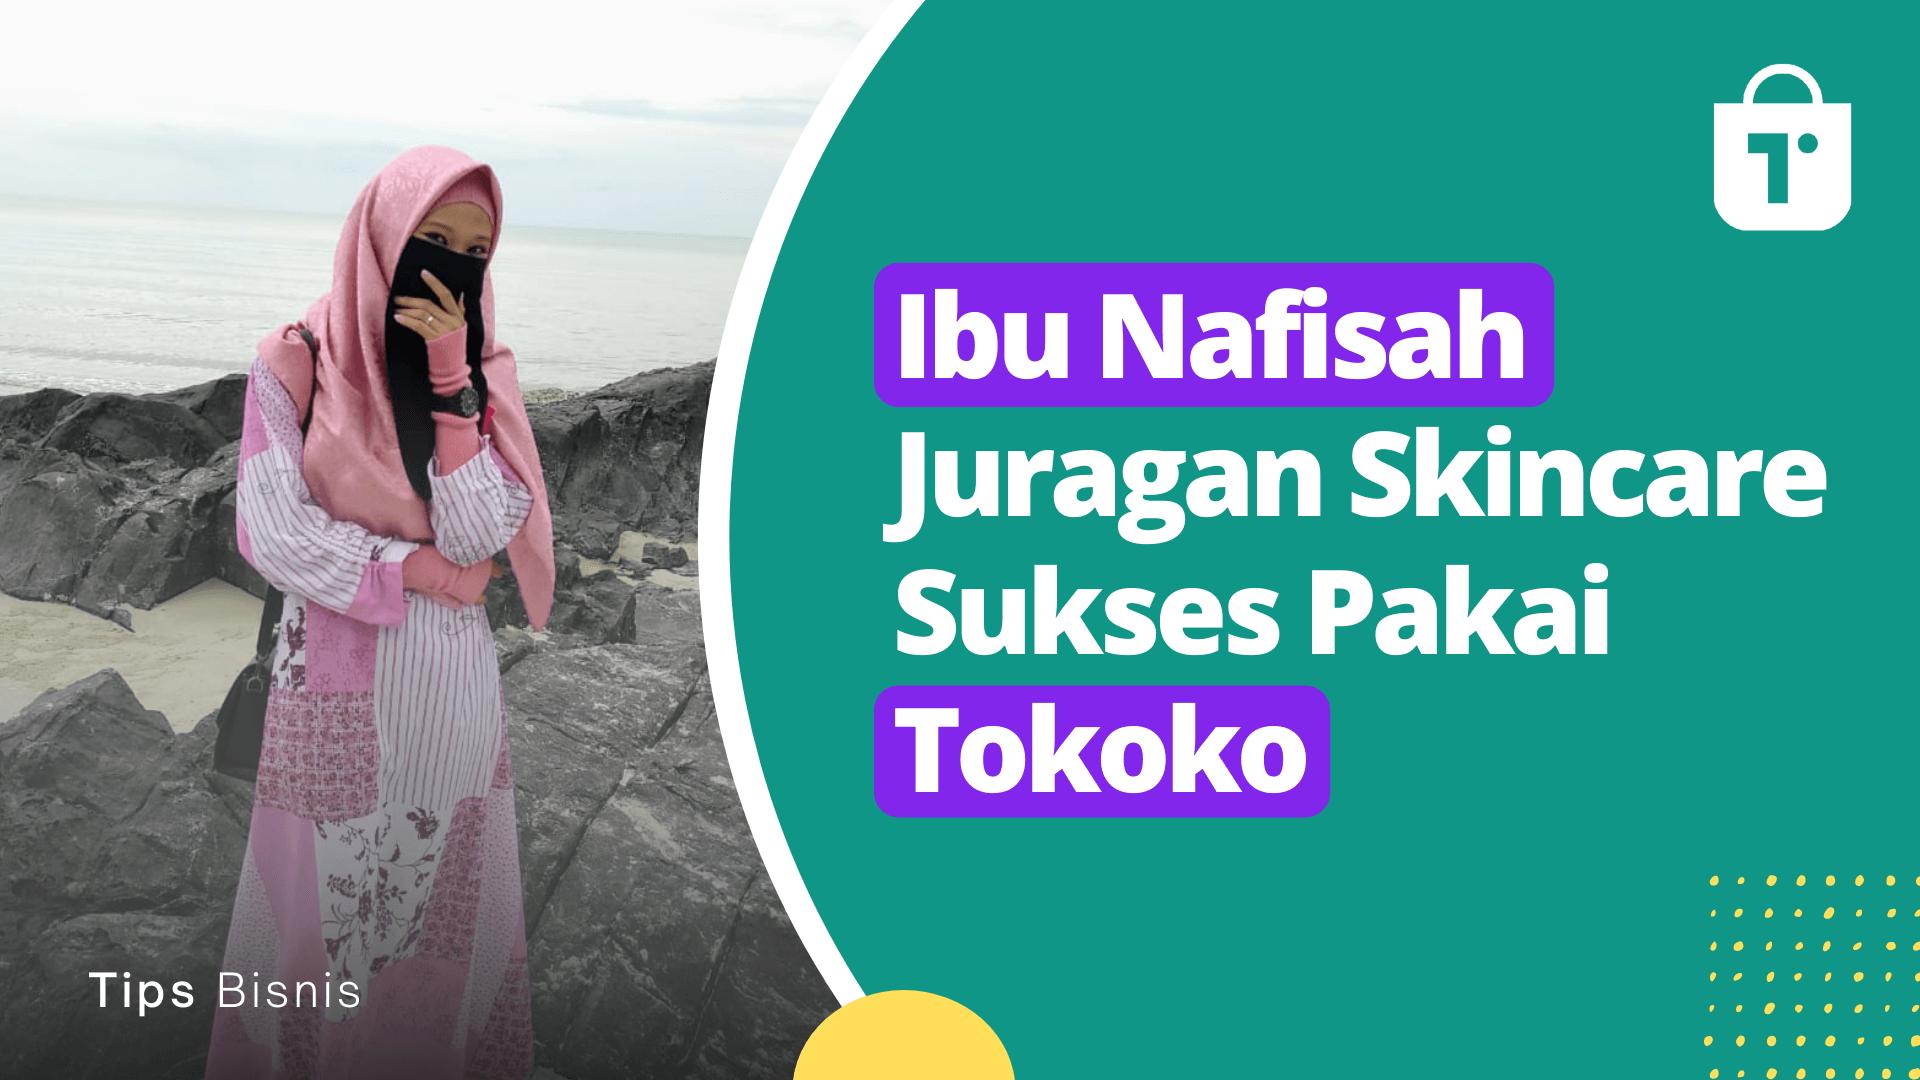 Ibu Nafisah, Juragan Produk Skincare Sukses Dapatkan Penjualan Pakai Tokoko